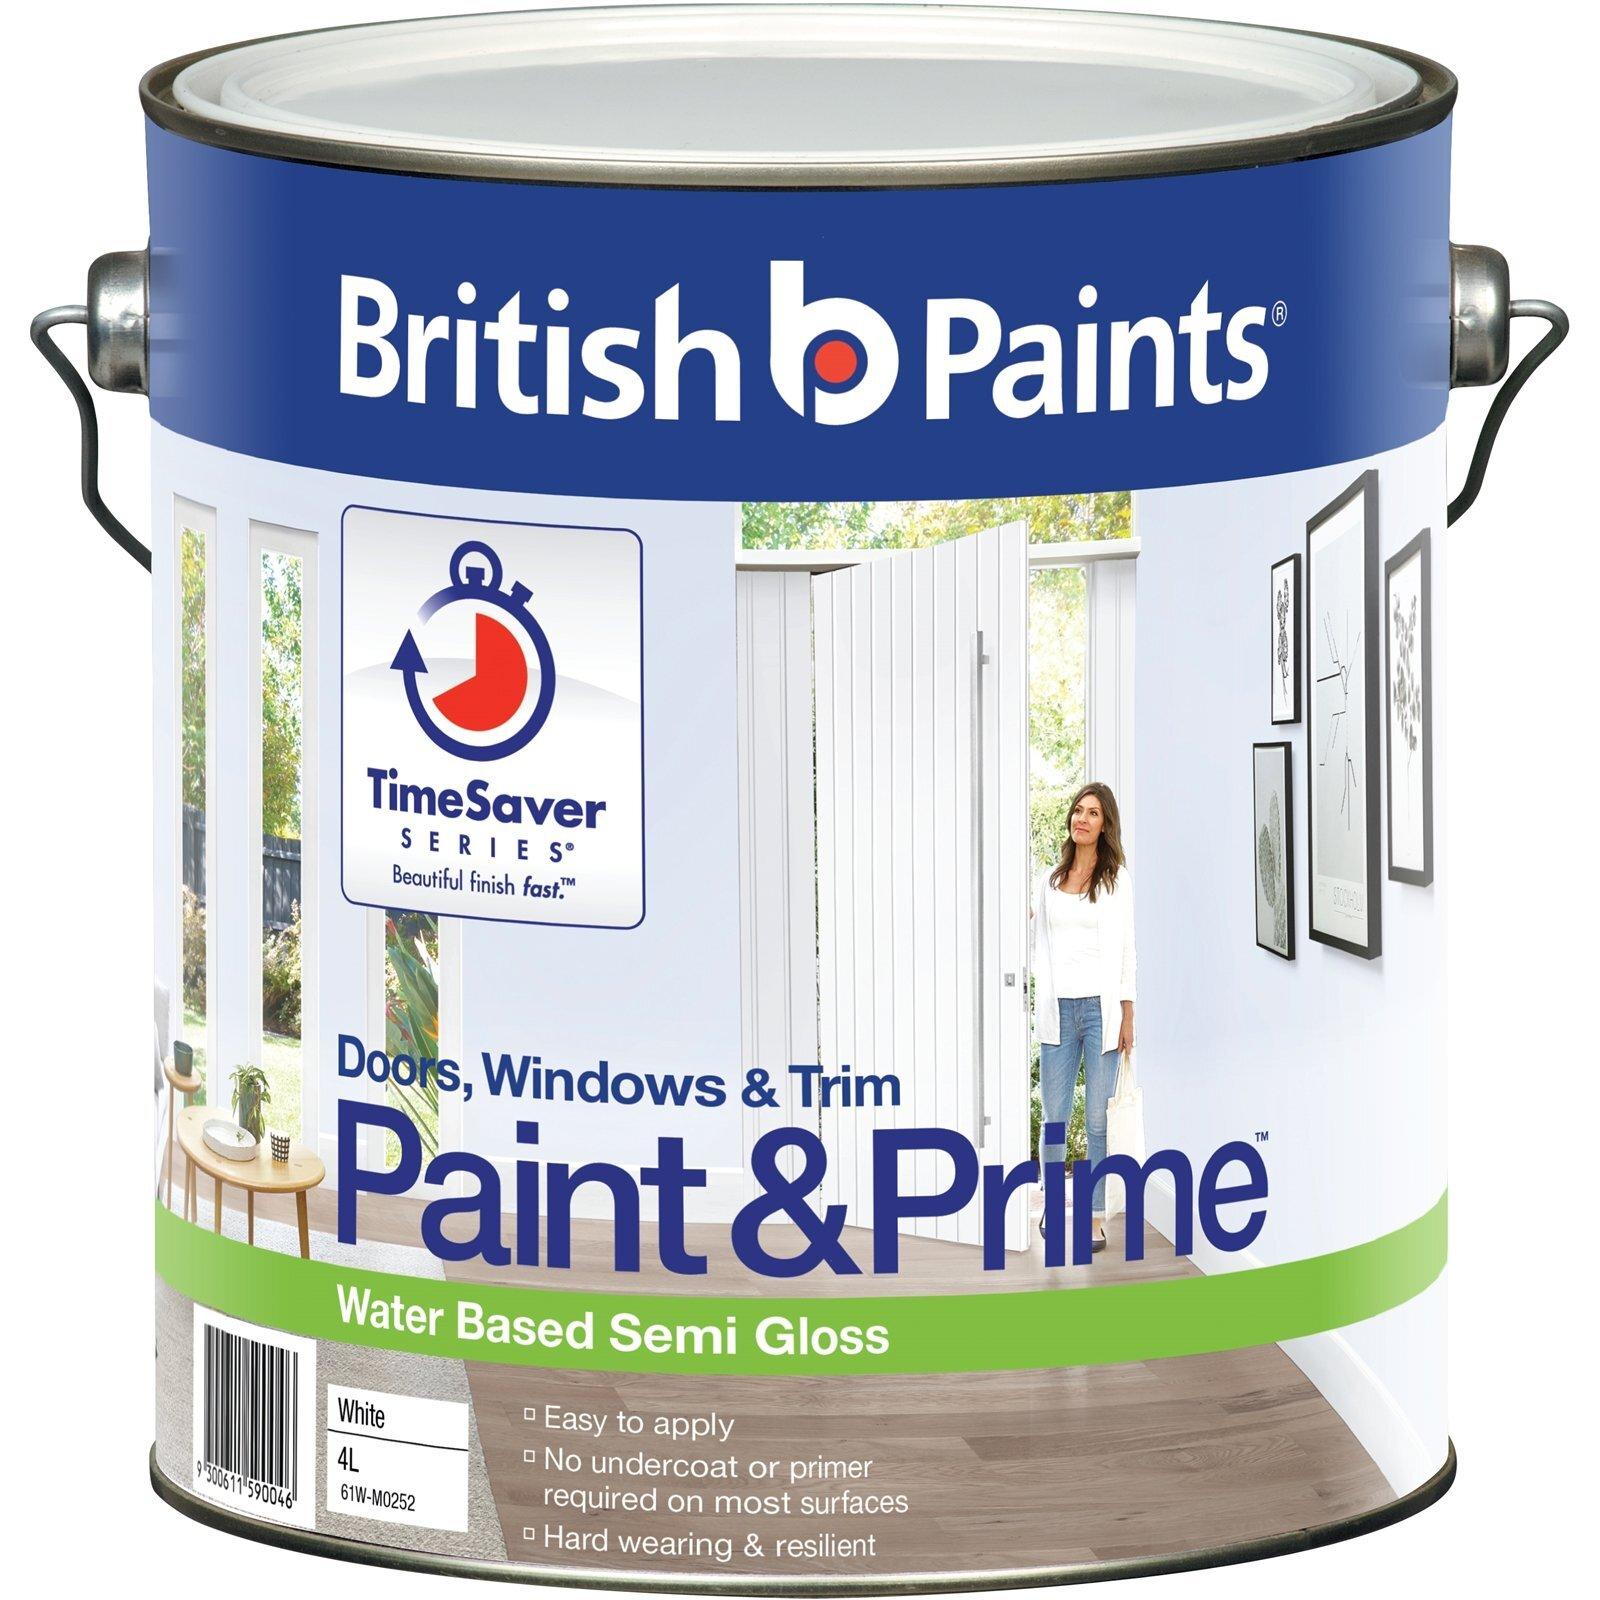 British Paints Paint&Prime 4L Semi Gloss White Doors, Windows And Trim